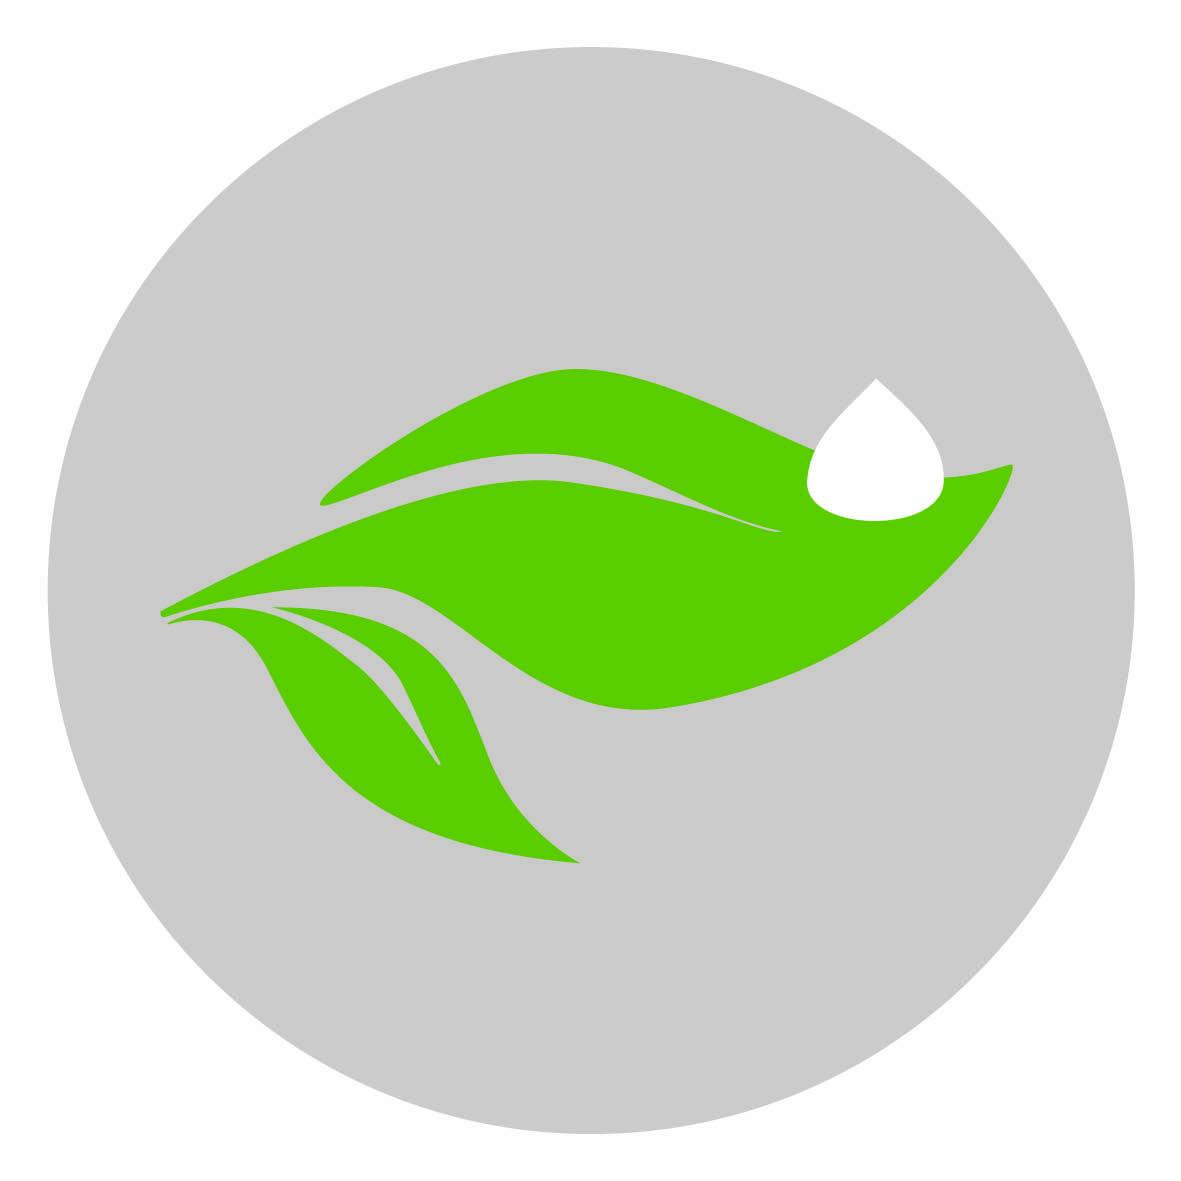 Flourcarboonfree_symbol